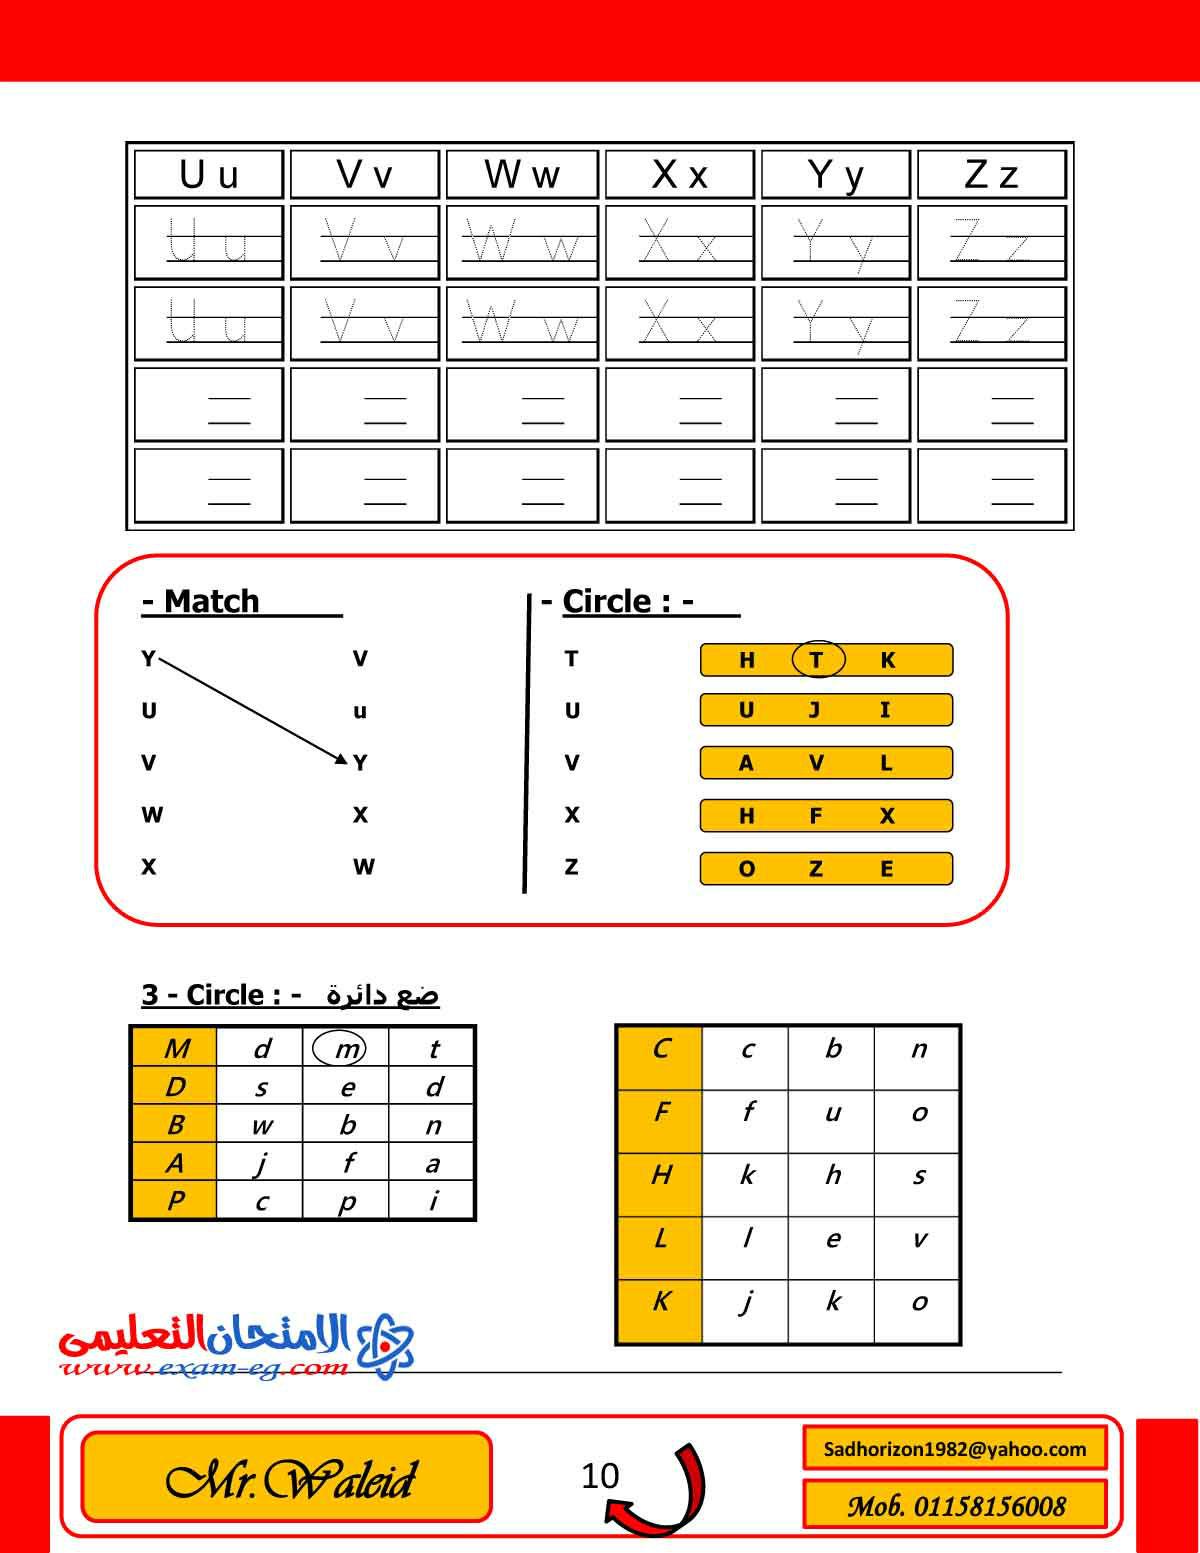 exam-eg.com_14494052434810.jpg